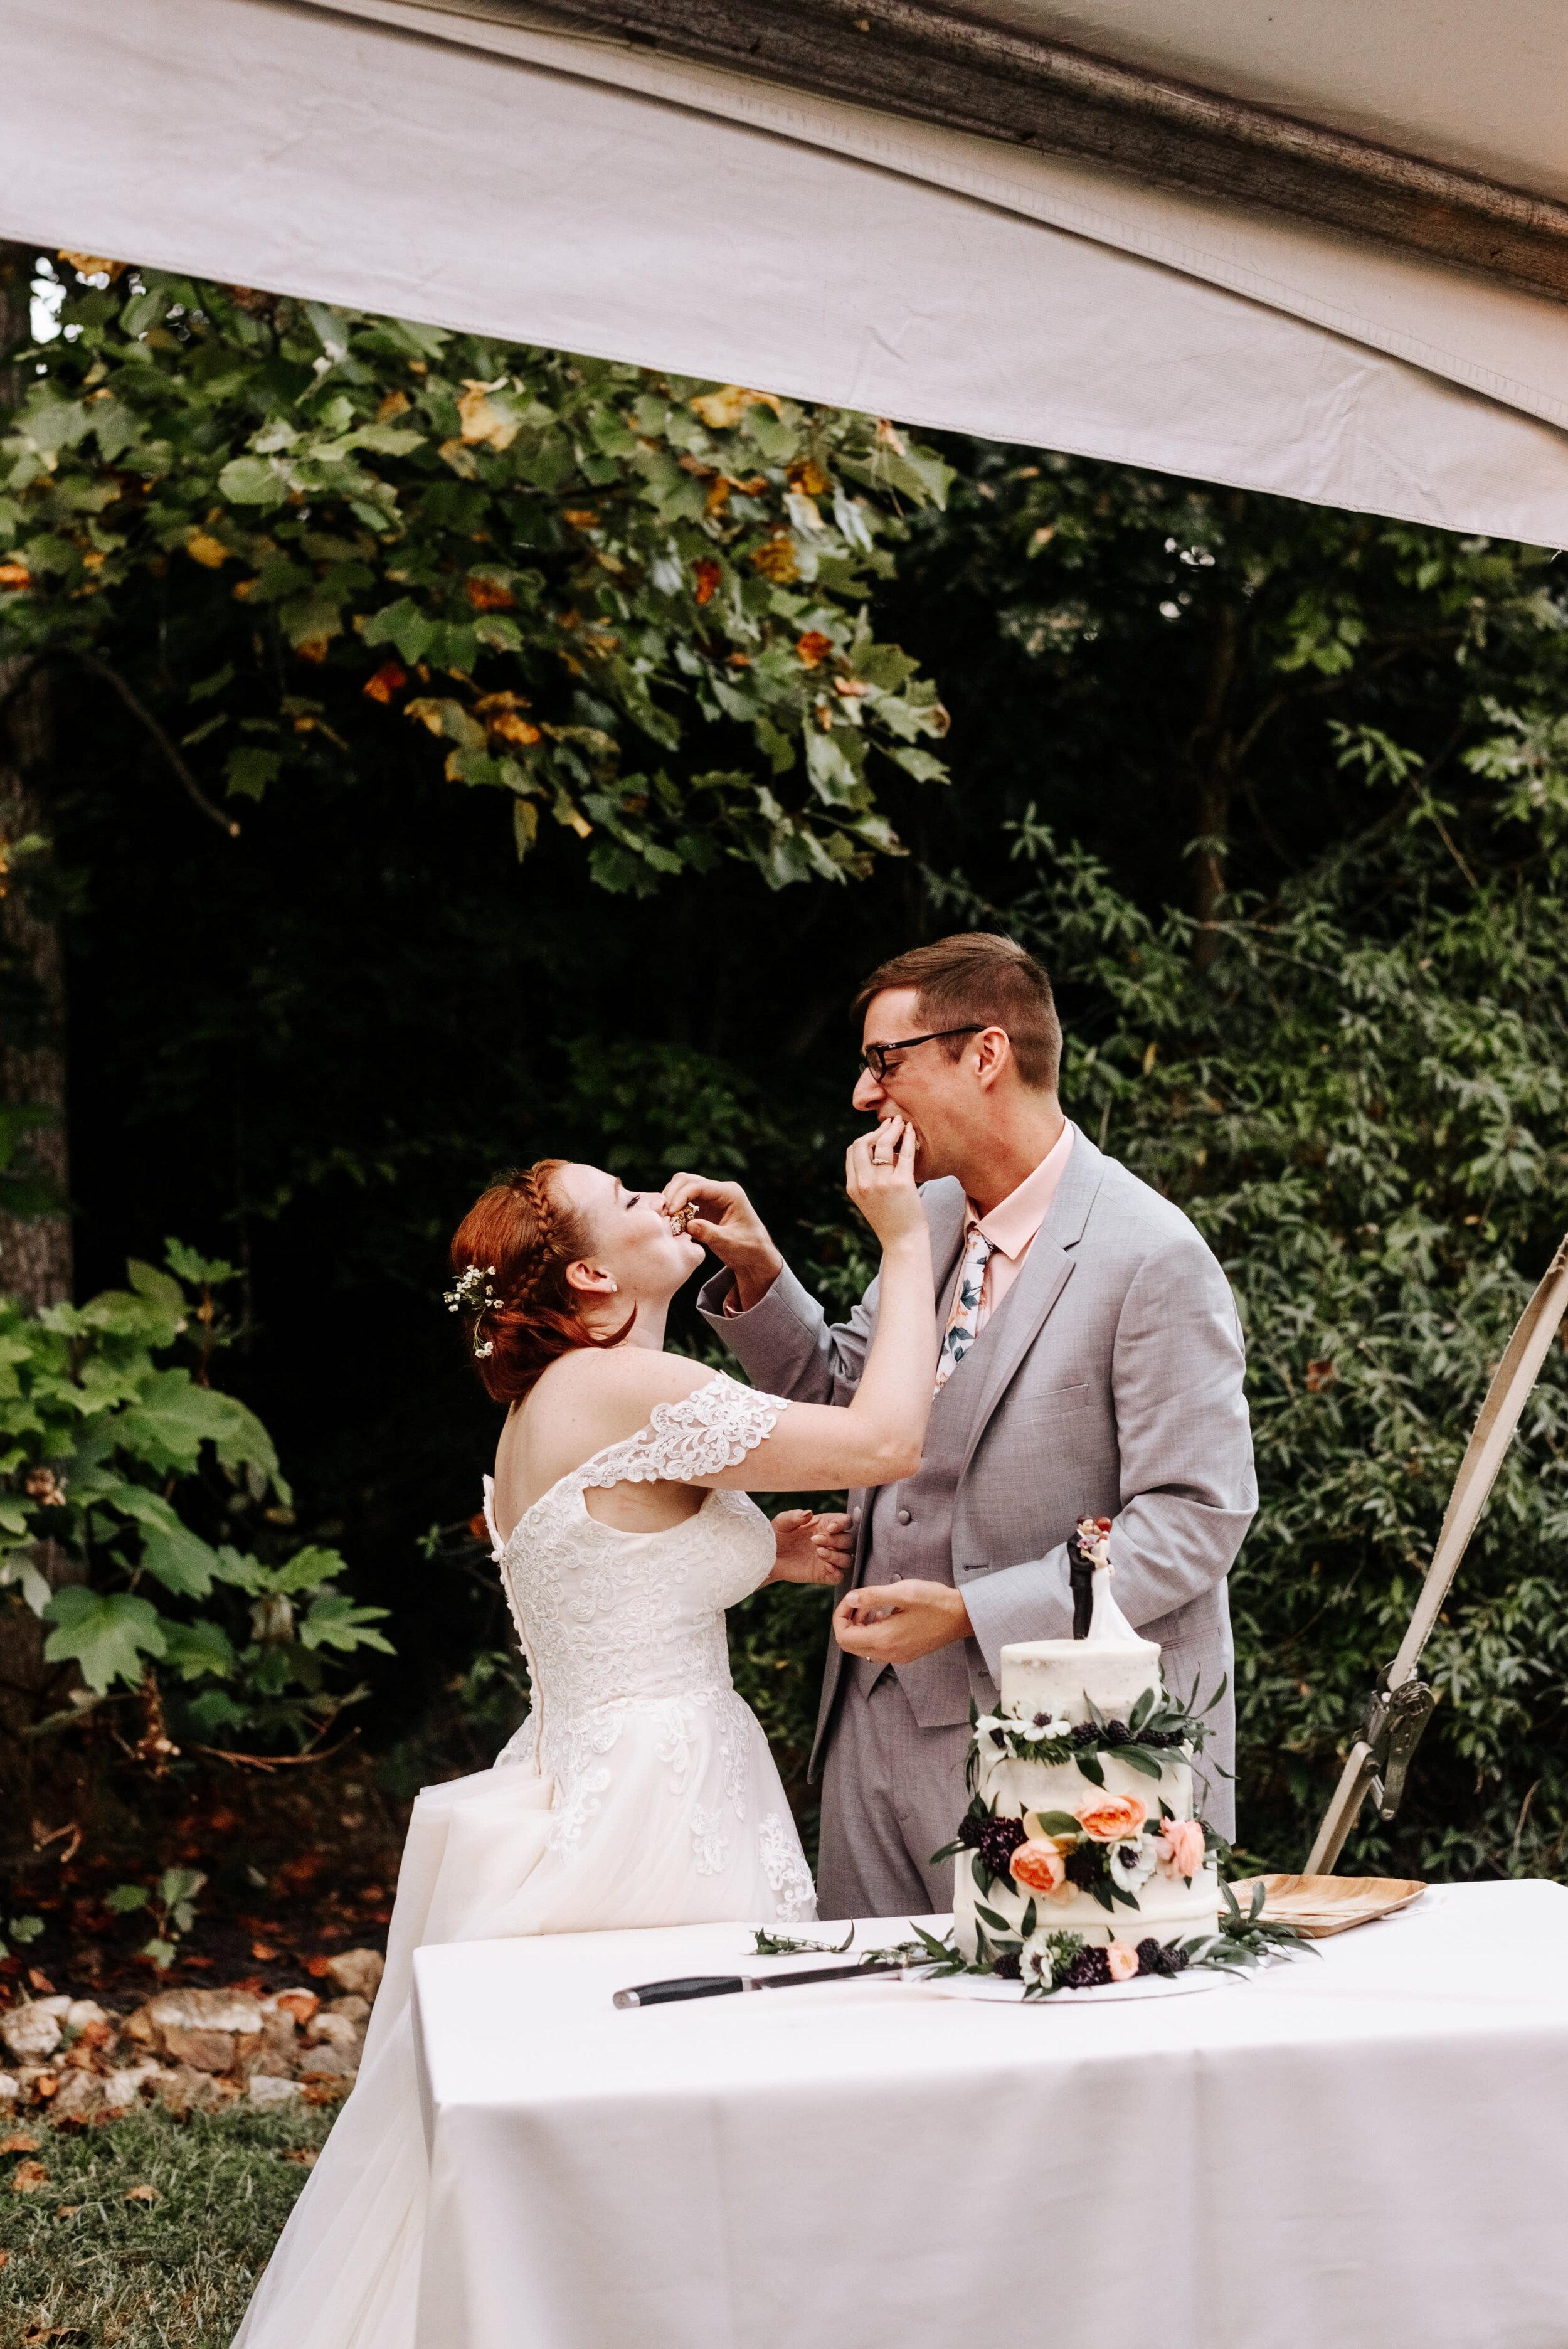 Rachel_David_Wedding_Richmond_Virginia_Photography_by_V_65.jpg